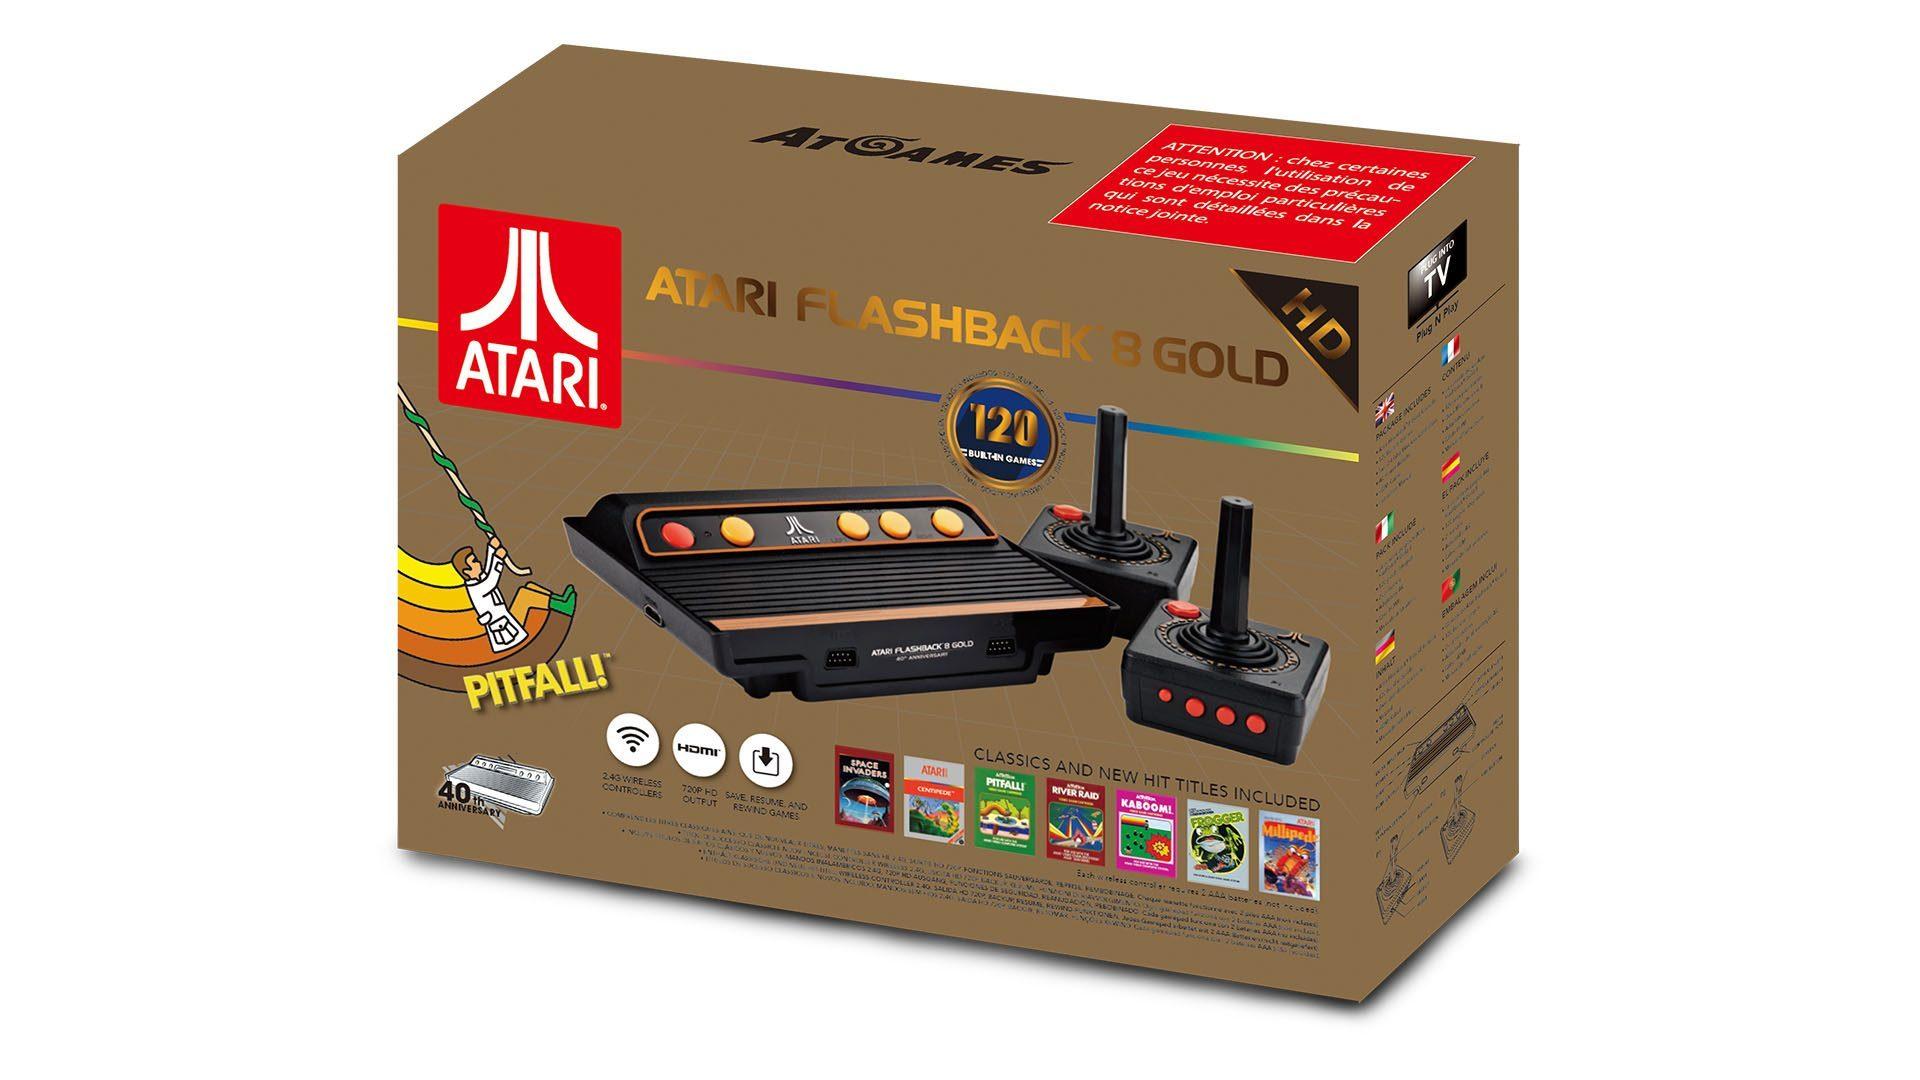 Atari_FlashBack_8_Gold